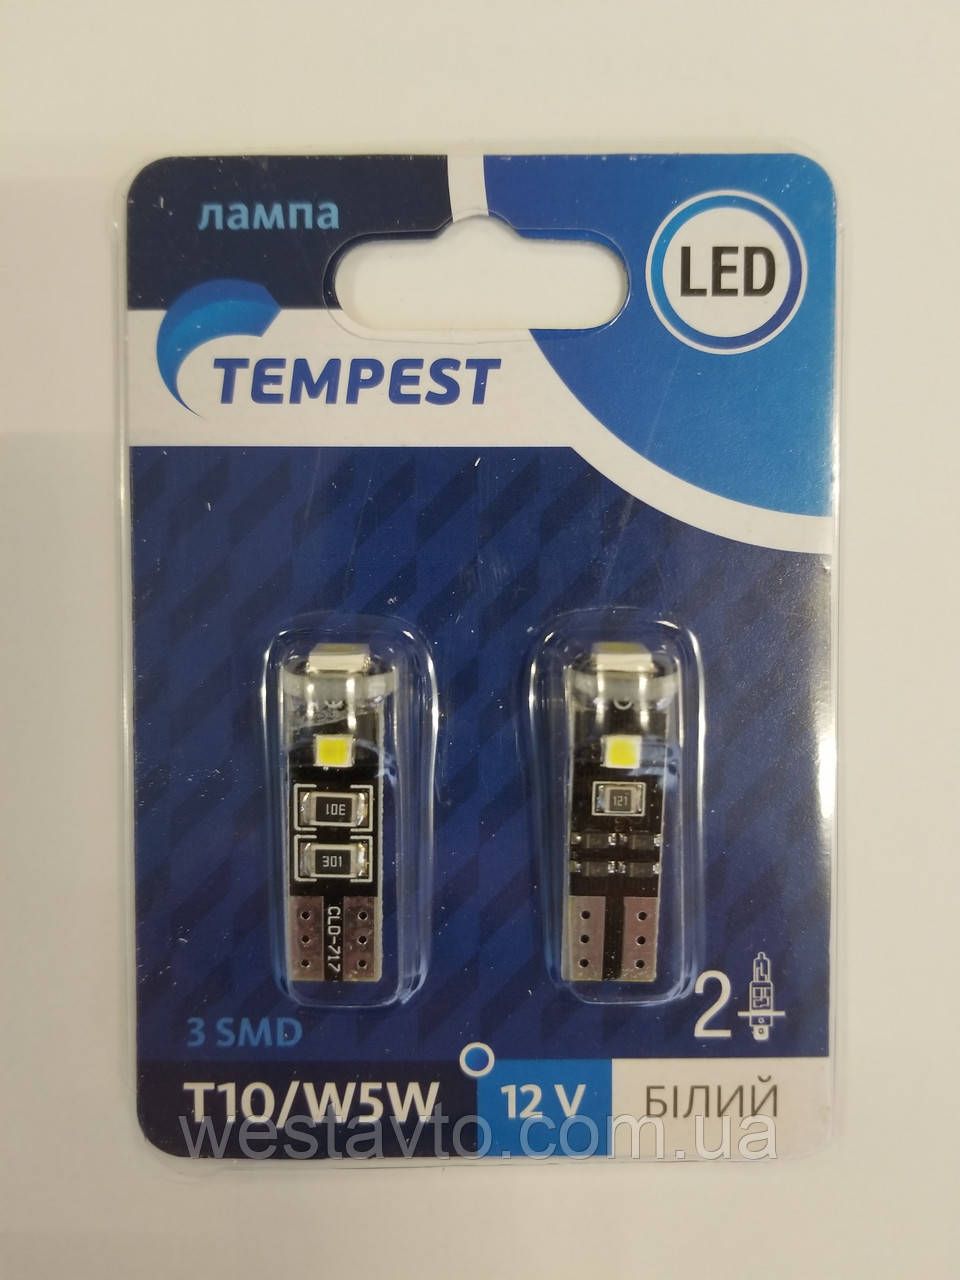 Лампа LED б/ц габарит и панель приборов T10 доп. сопр. 2SMD W5W 12V WHITE2шт. блистер